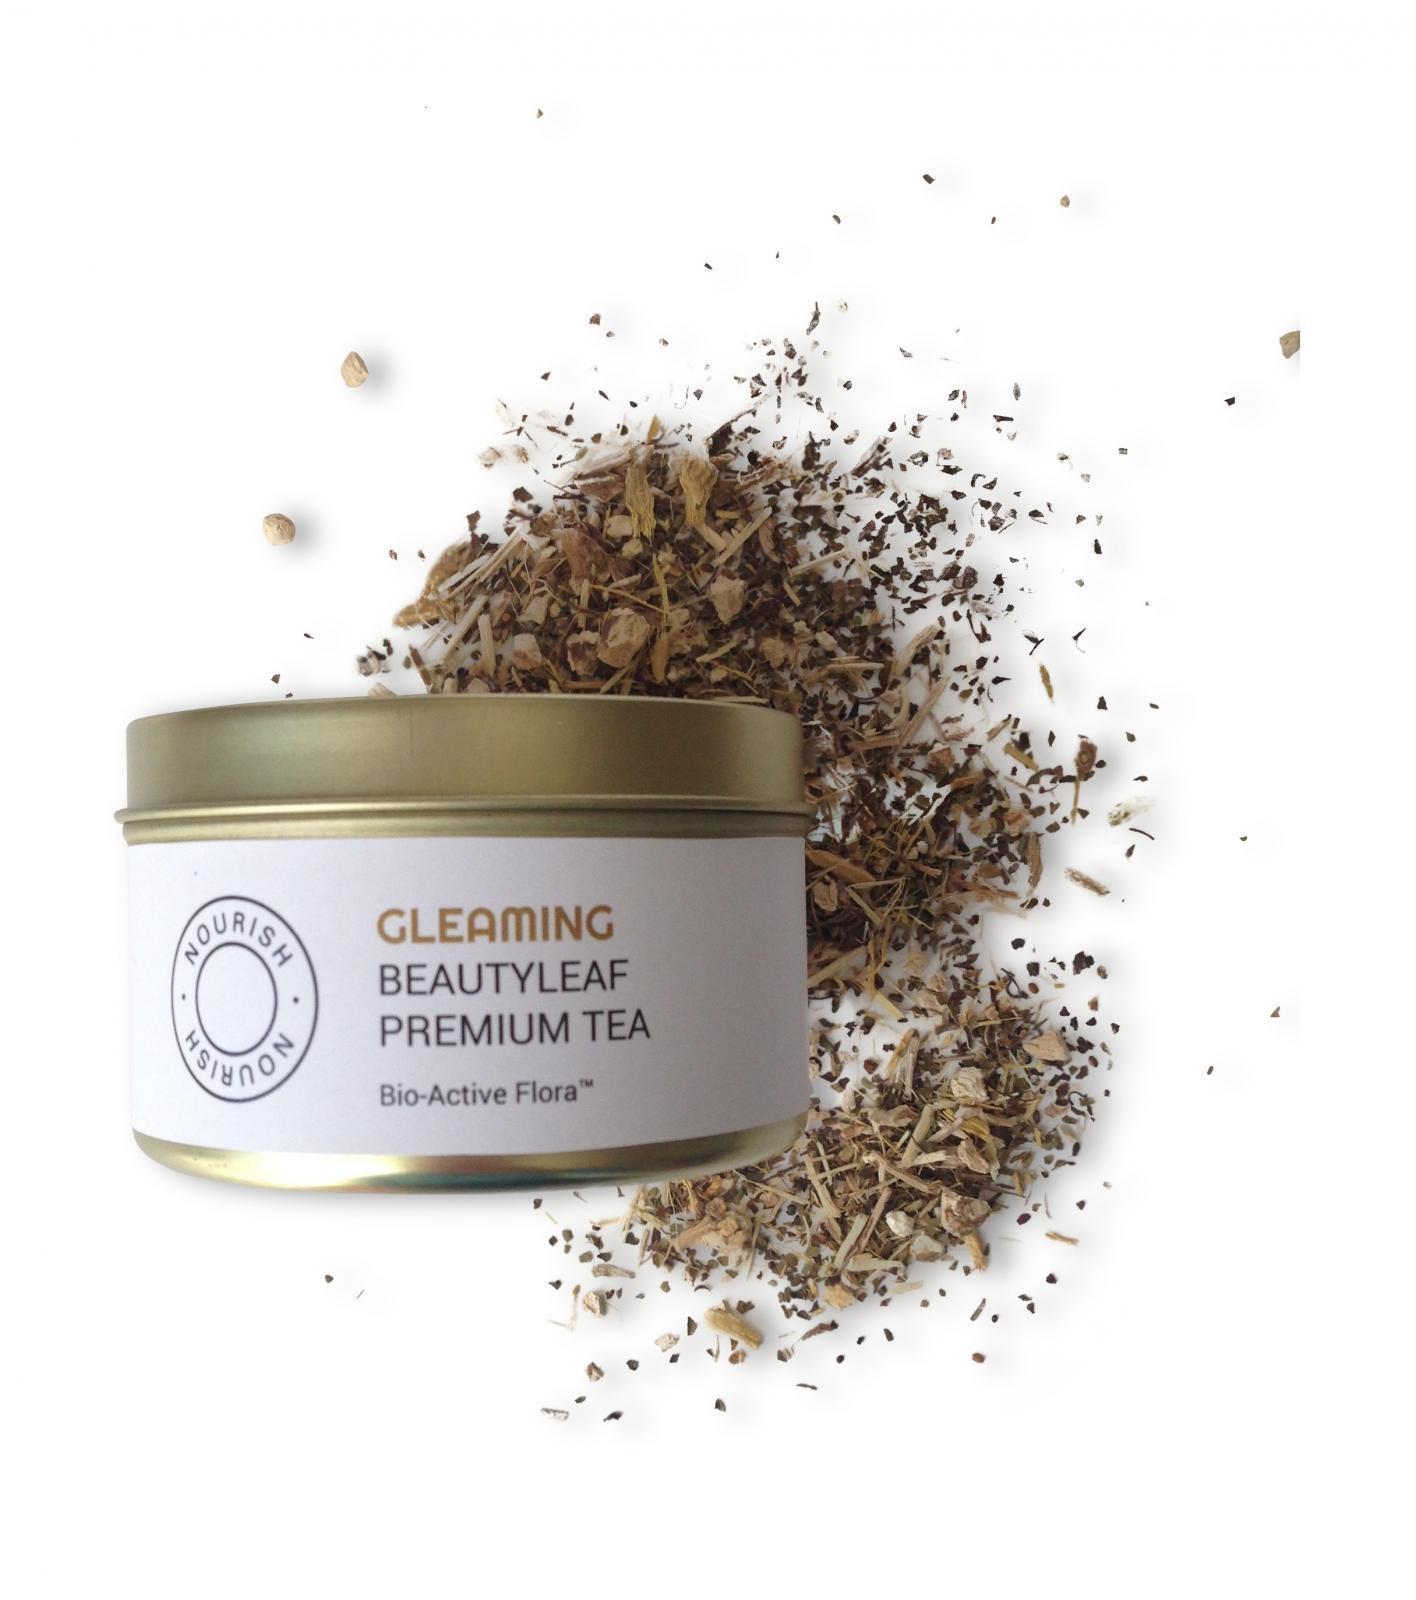 Gleaming BeautyLeaf Premium Tea